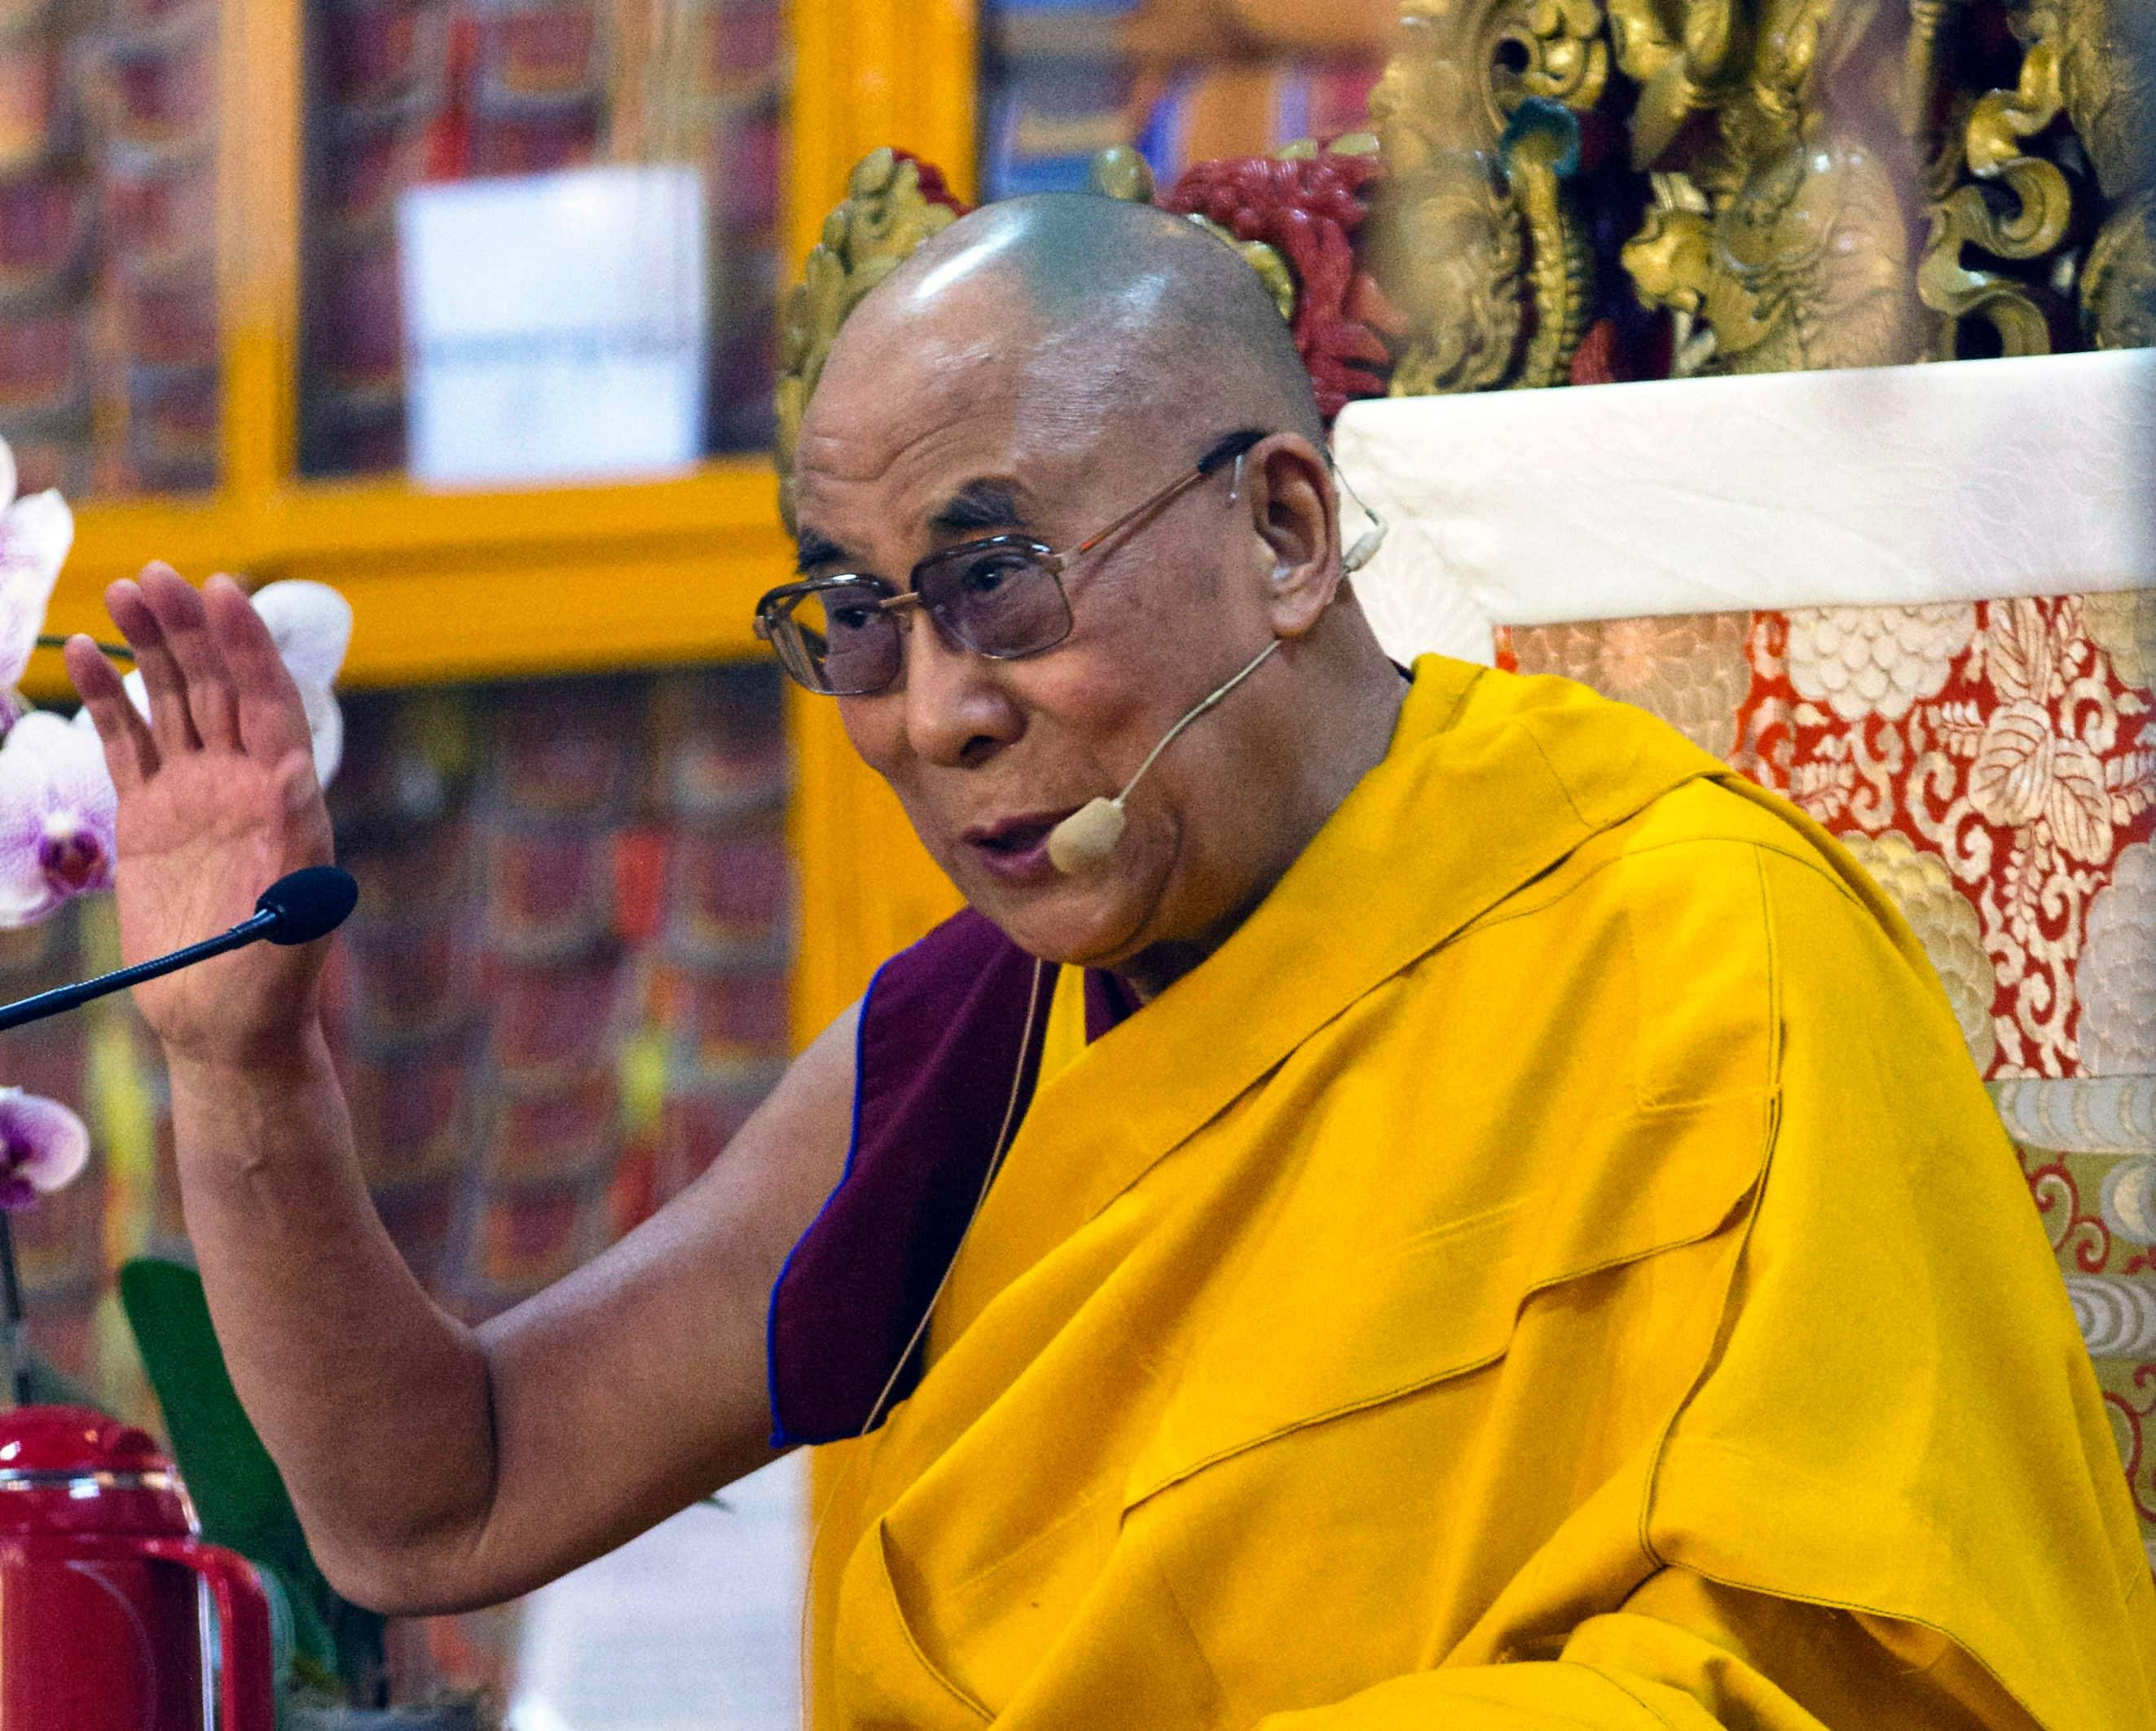 Tibetan spiritual leader the Dalai Lama gestures during a religious talk at the Tsuglakhang temple in Dharmsala.